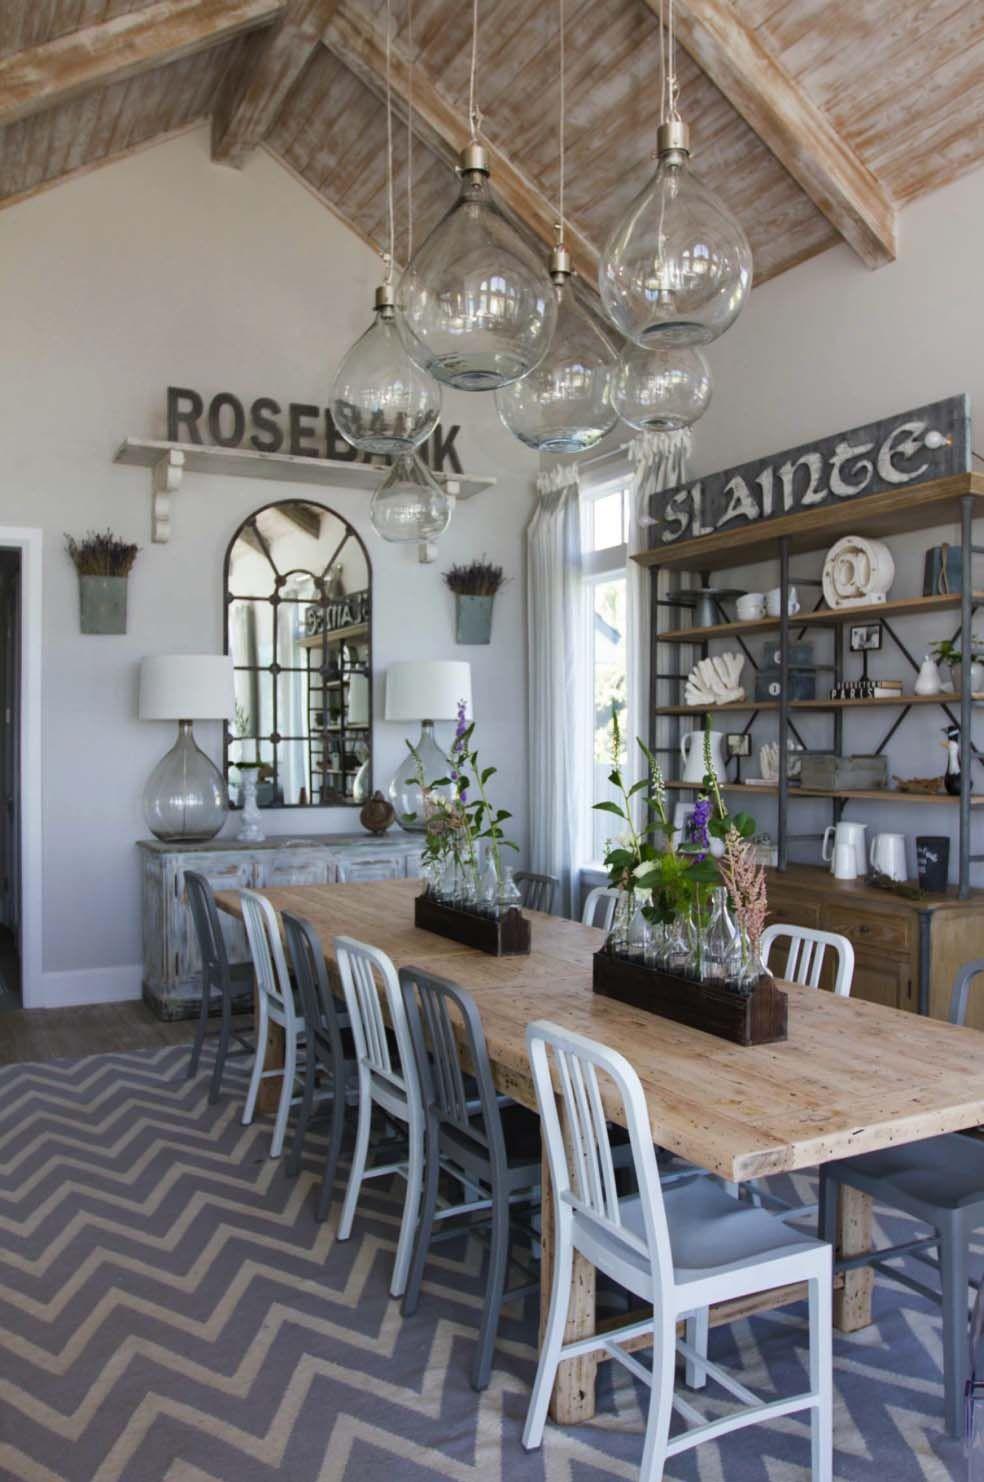 Coastal Chic Shingle Style Gambrel Home In Sunny Florida Modern Dining RoomsCoastal